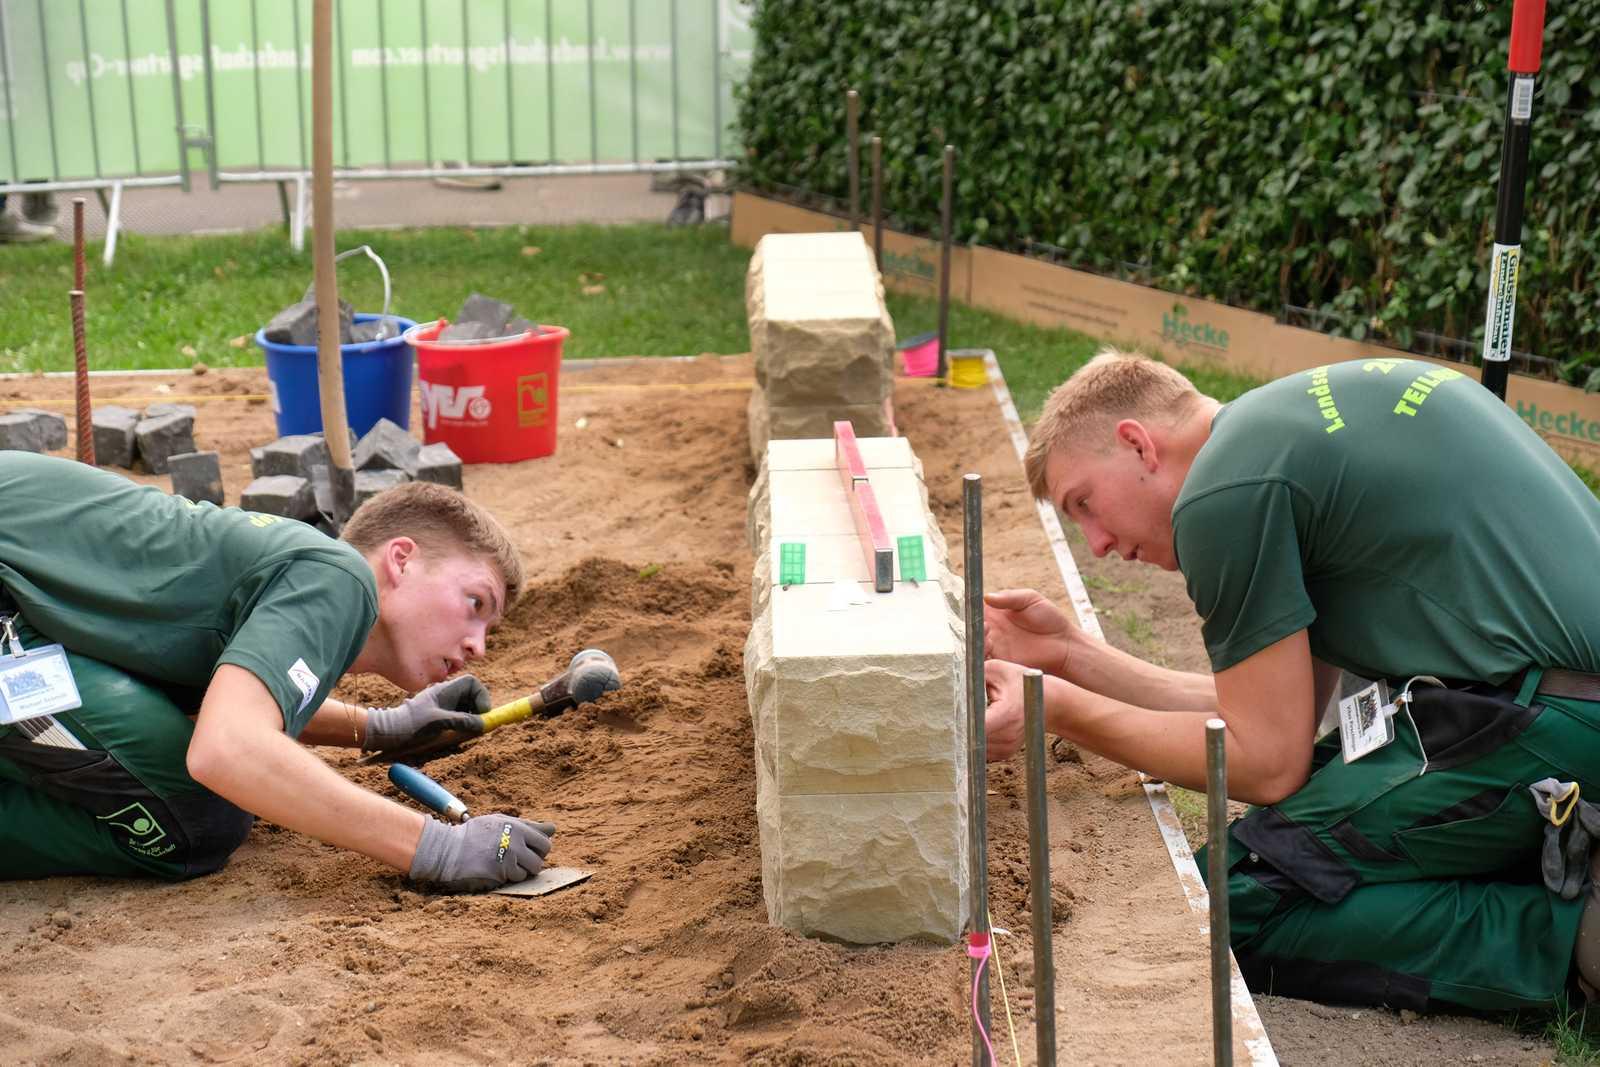 Landschaftsgärtner Cup In Nürnberg Bester Nachwuchs Kommt Aus